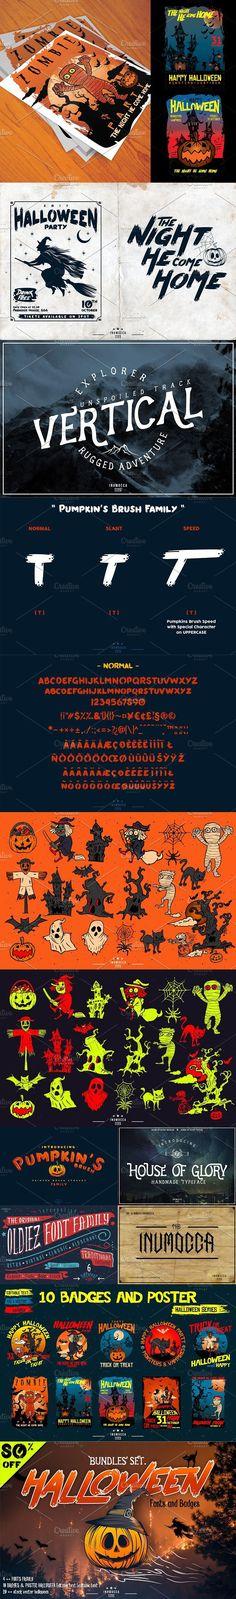 HALLOWEEN bundles SET (80%) Halloween Fonts, Display, Retro, Poster, Floor Space, Billboard, Retro Illustration